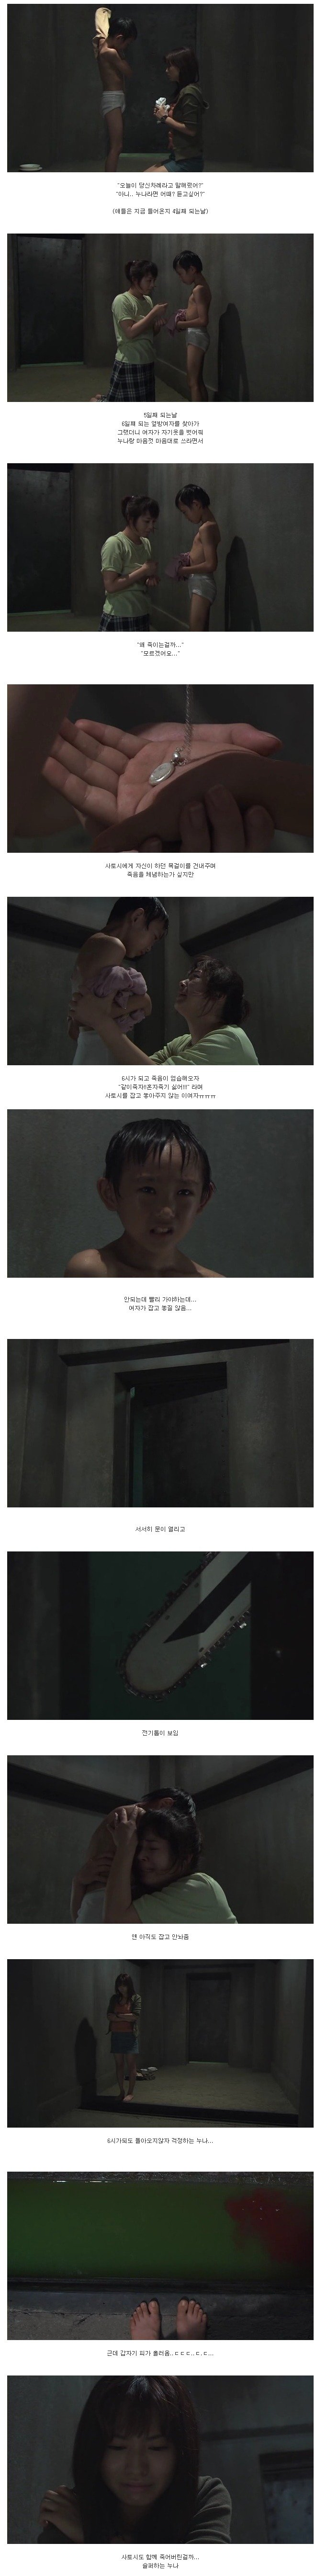 6.jpg 호러단편 - 일곱개의 방